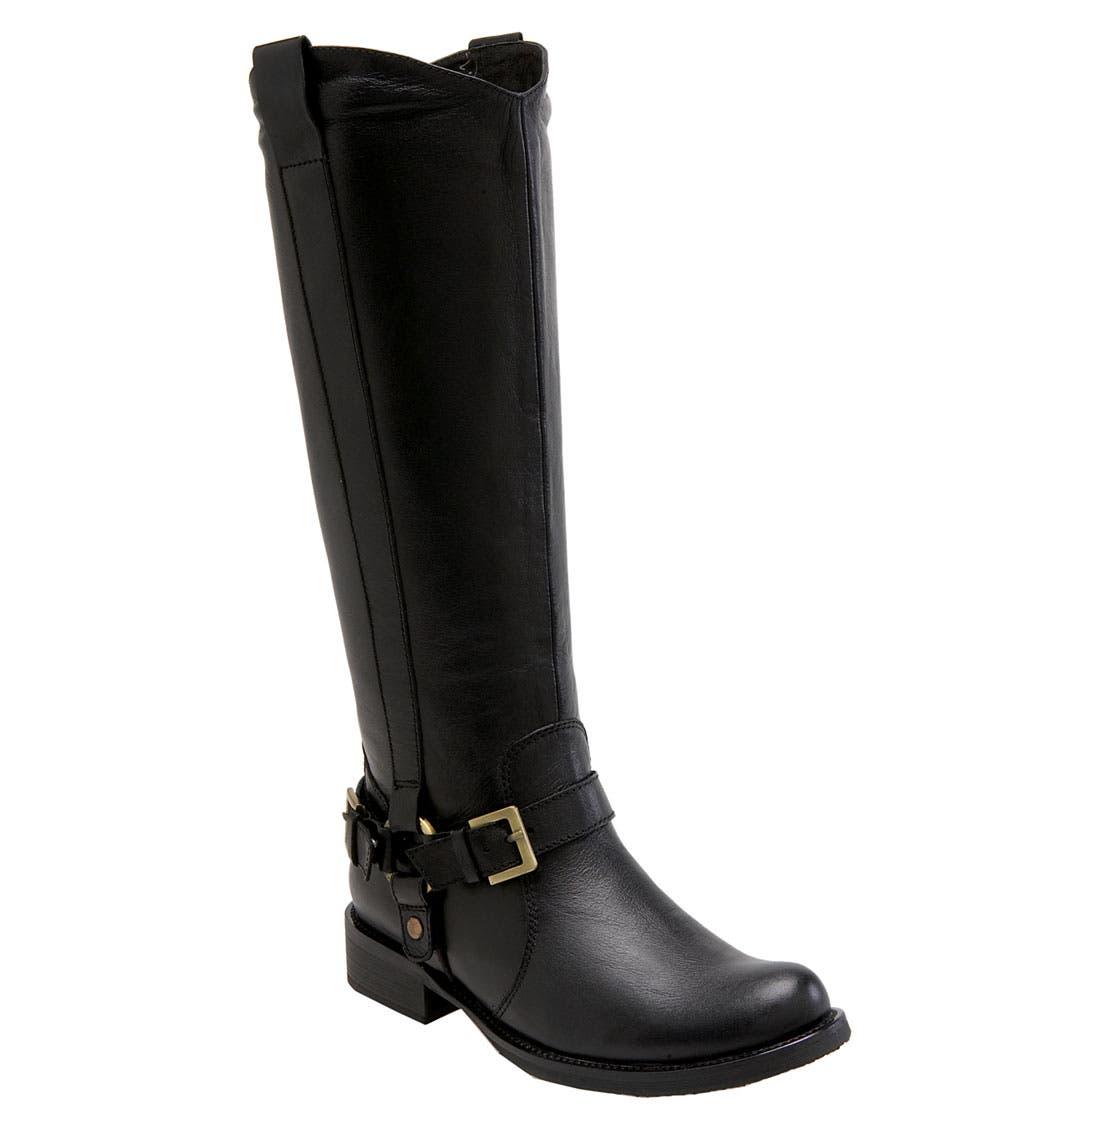 Alternate Image 1 Selected - Miz Mooz 'King' Boot